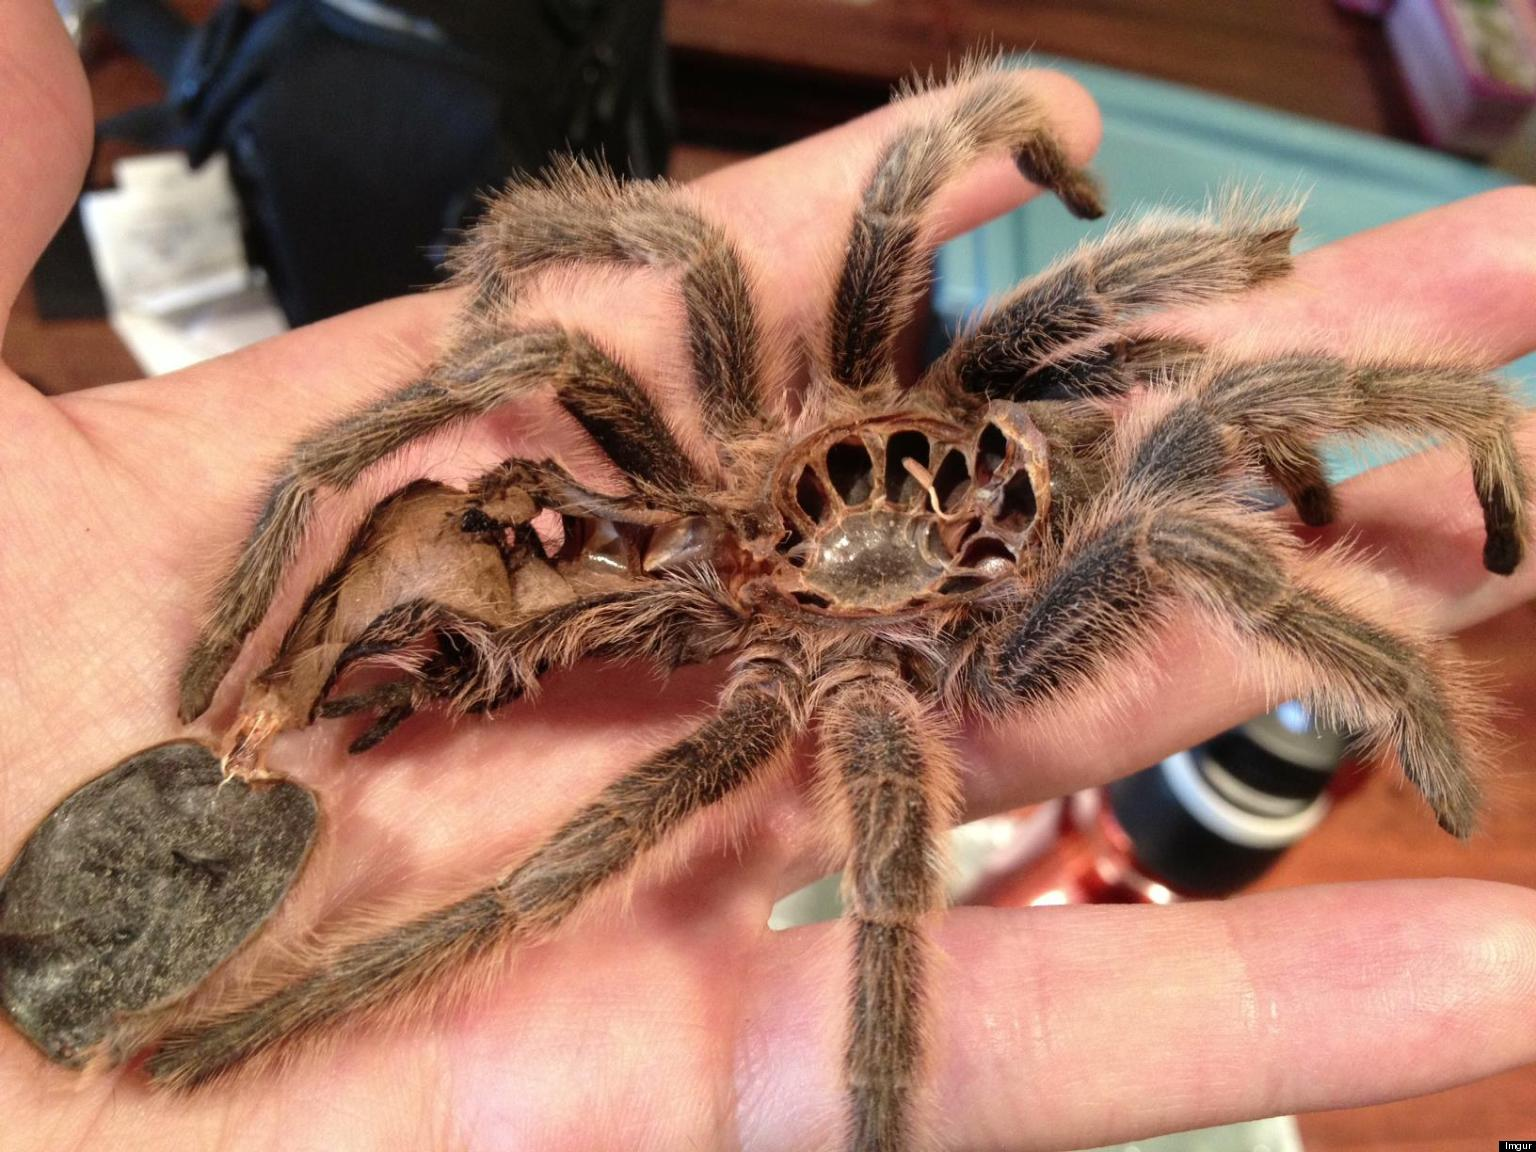 Pet tarantula on face - photo#6